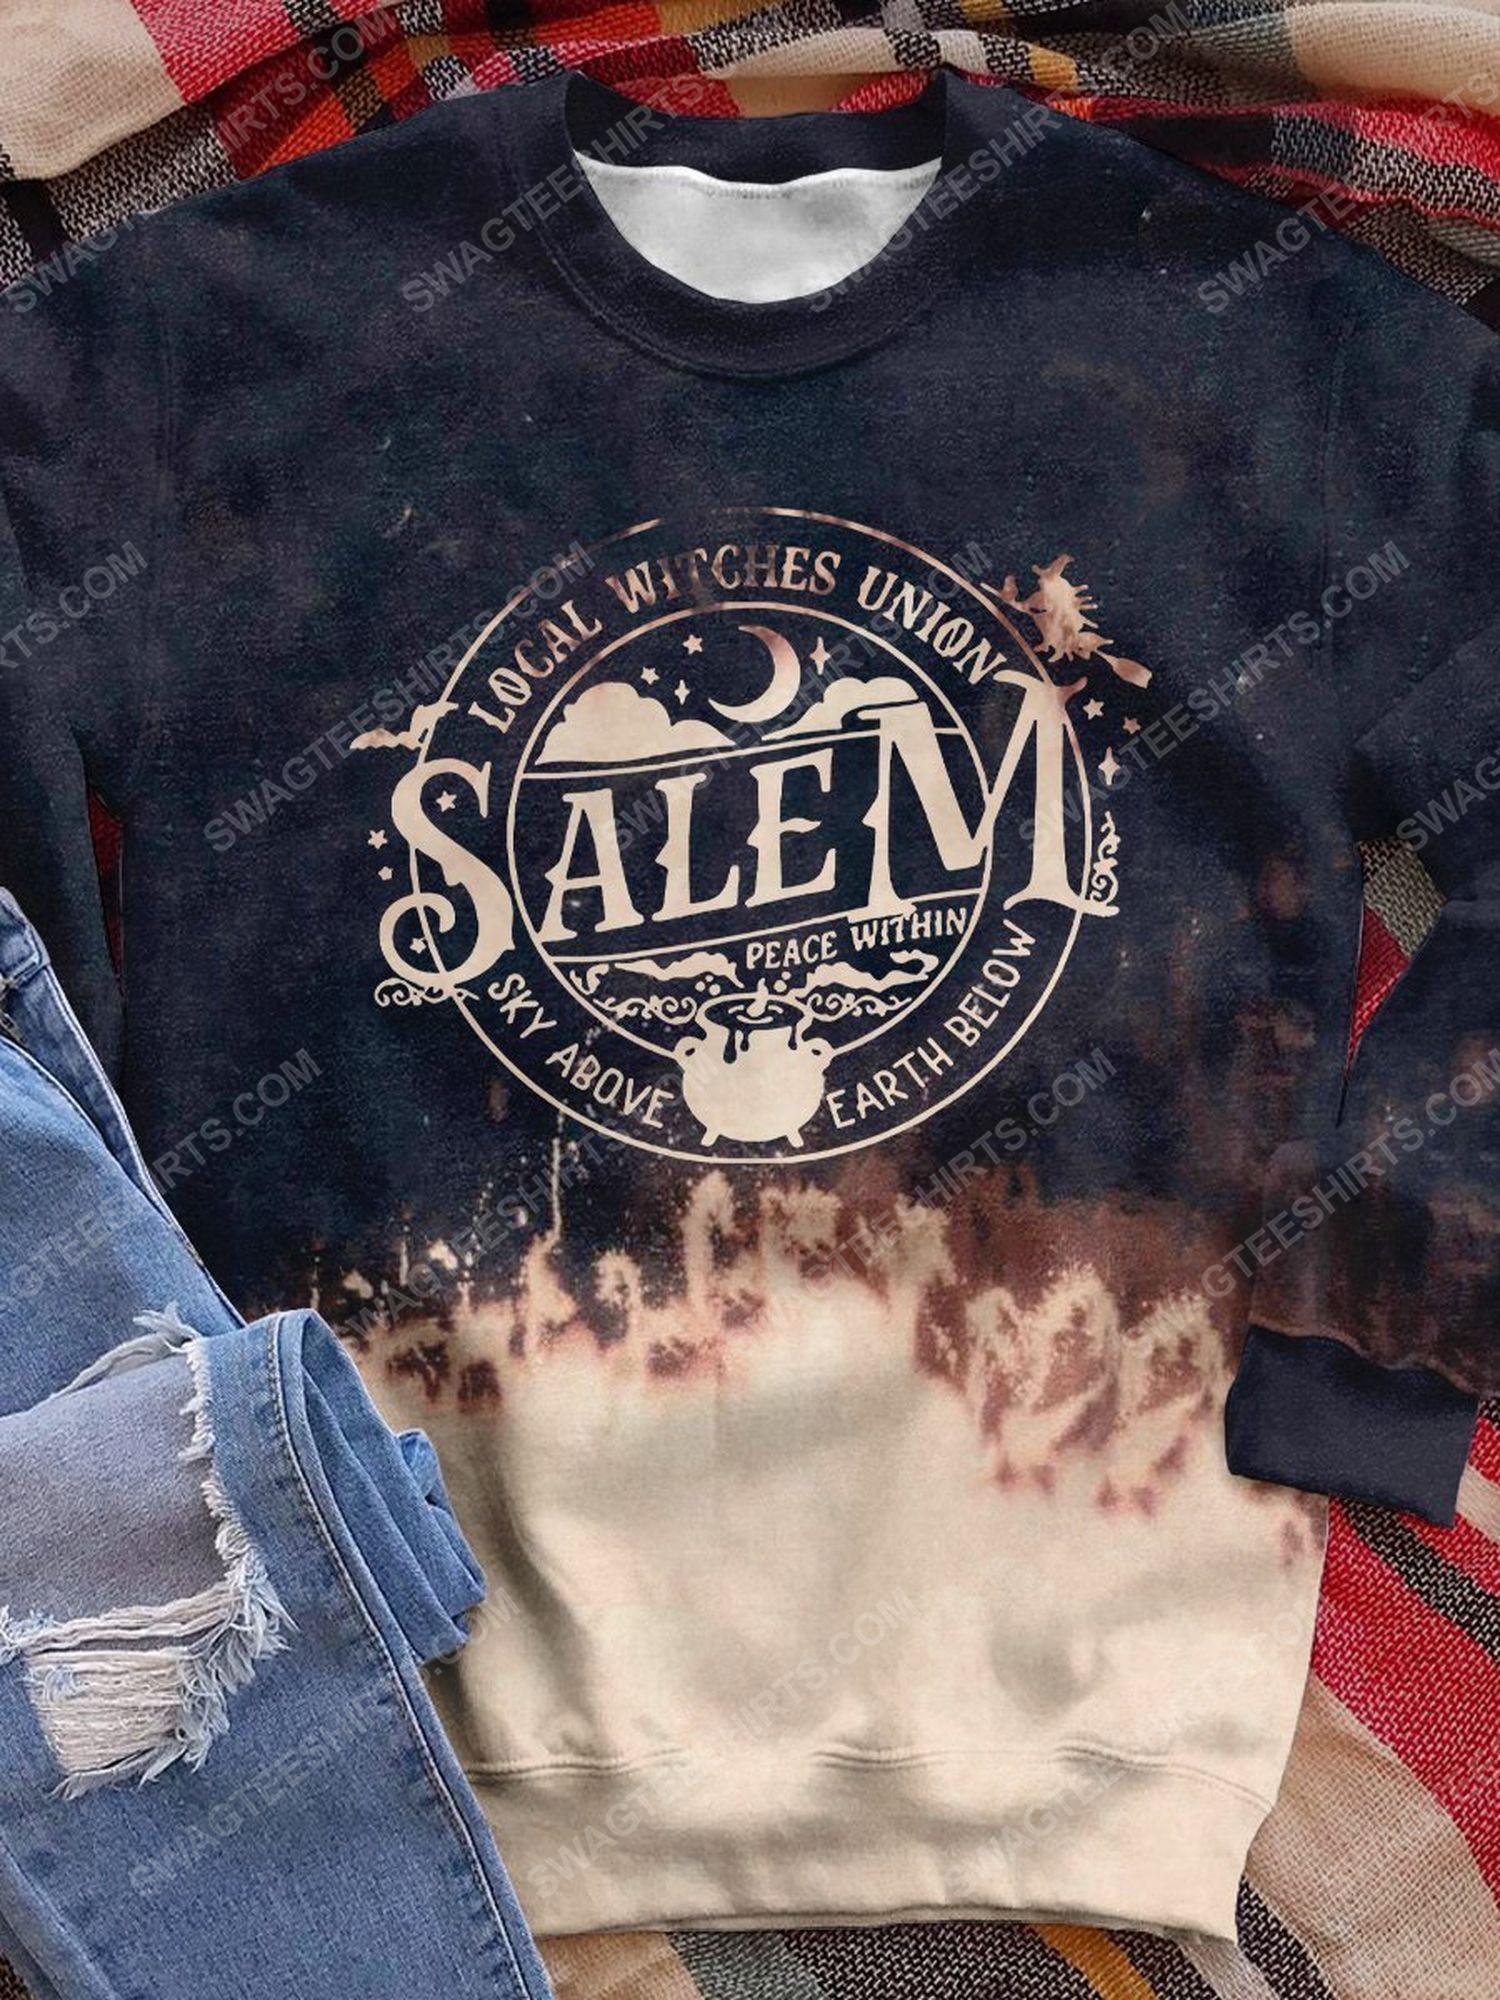 Halloween night local witches union salem shirt 1 - Copy (2)